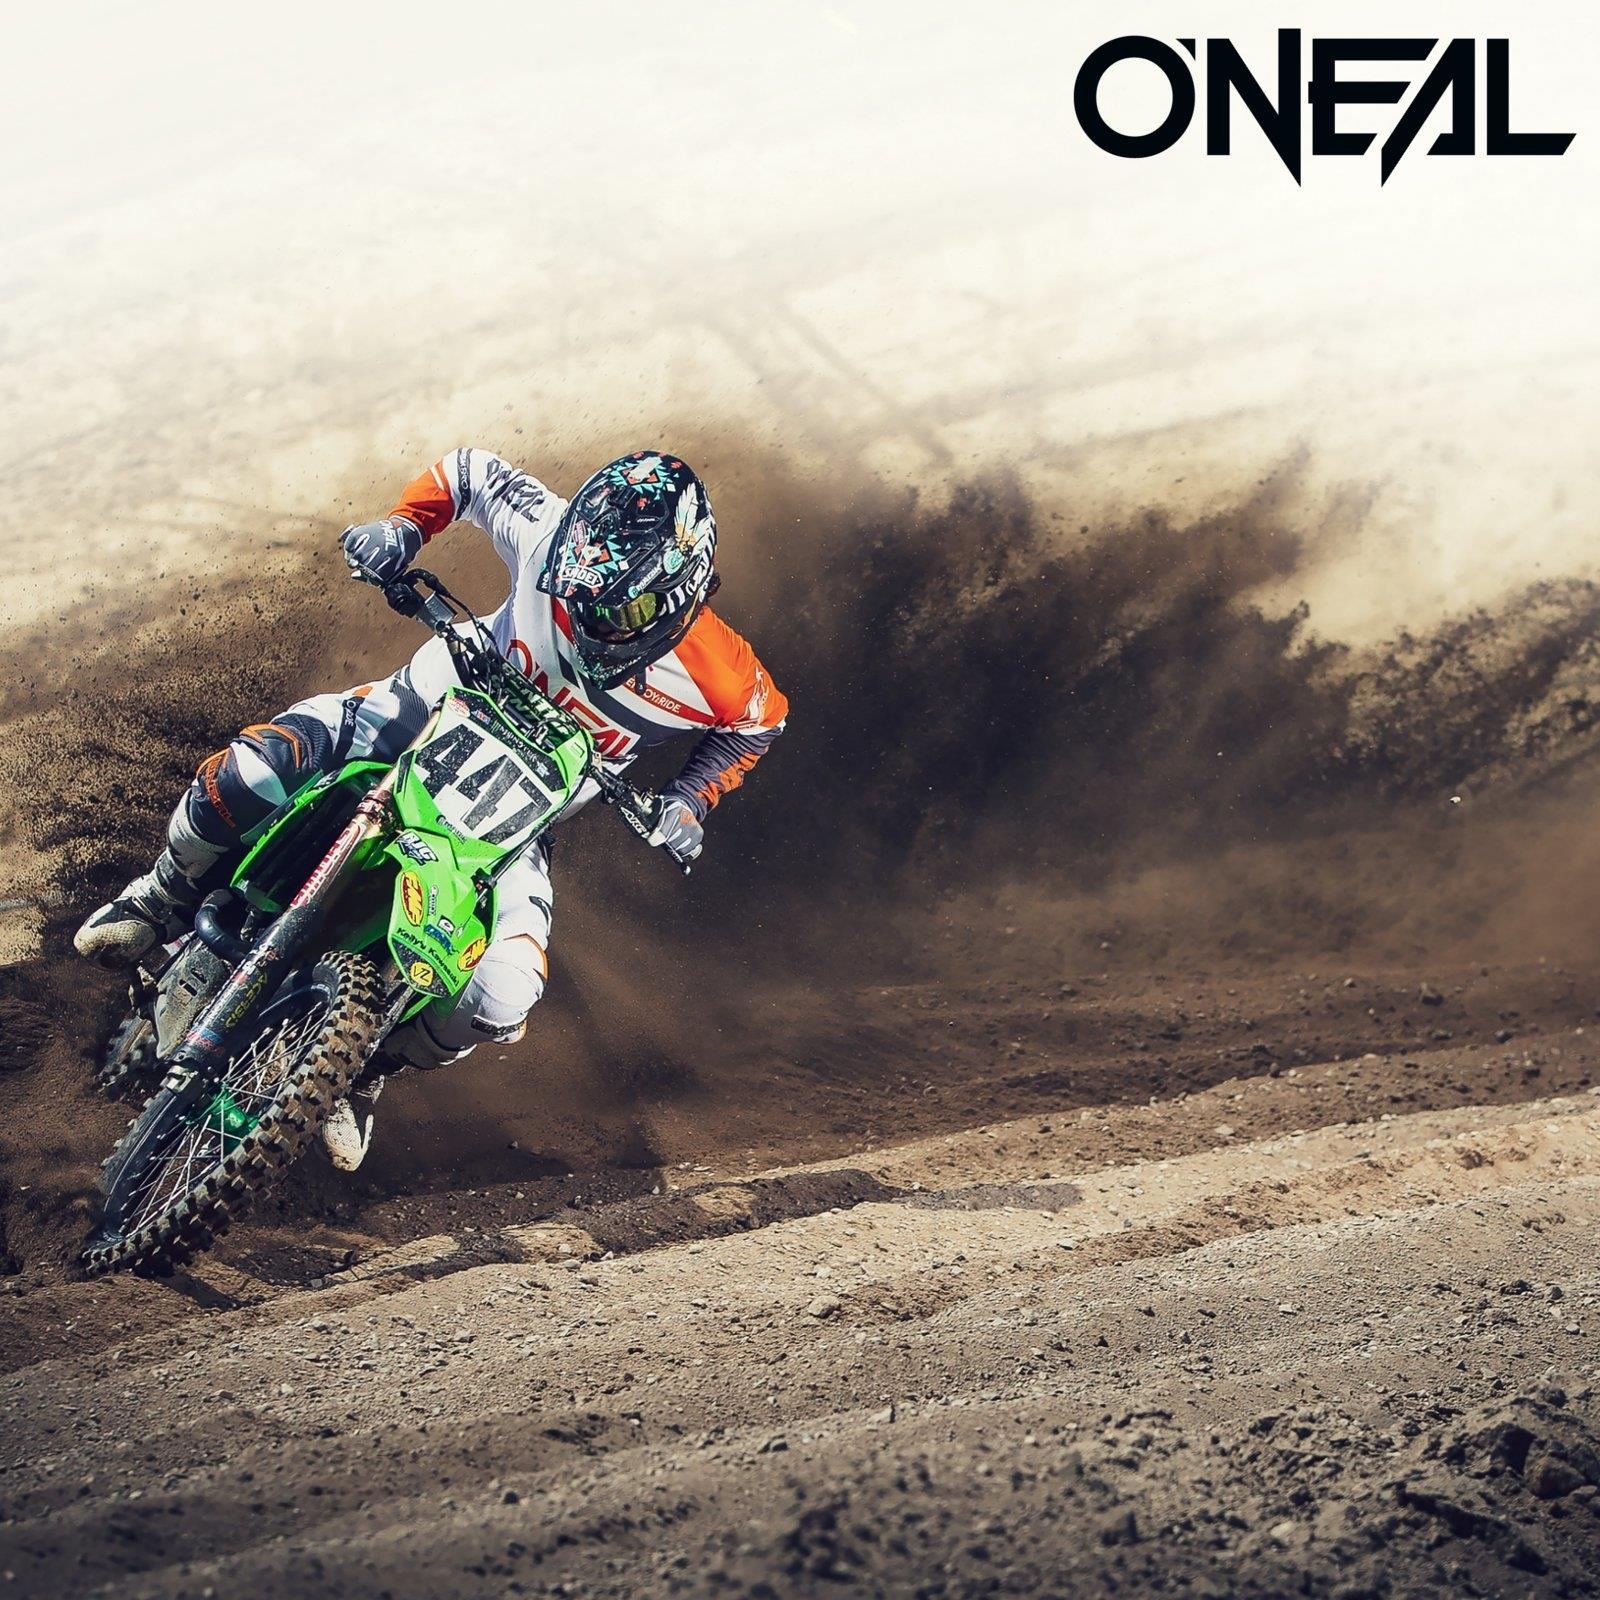 Oneal-elemento-Mayhem-Hardwear-Pants-pantalones-MX-DH-FR-Moto-Cross-Enduro-MTB-moto miniatura 15